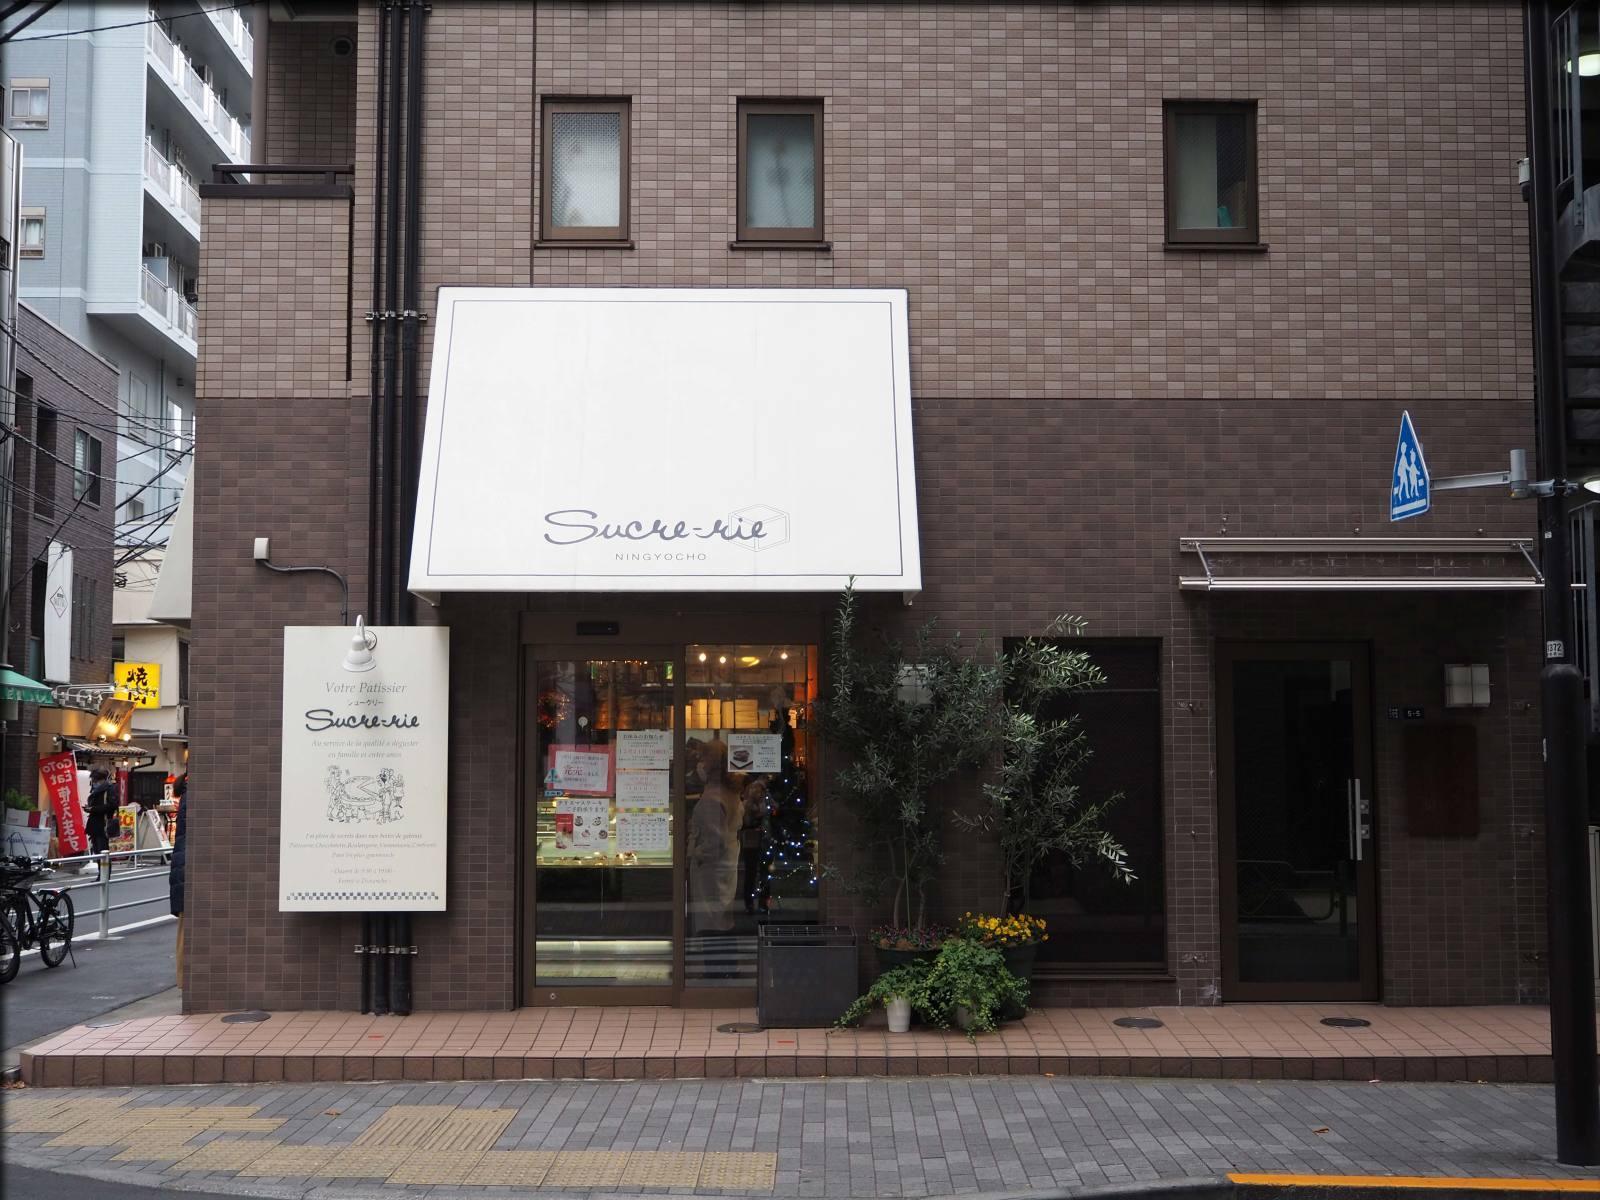 Sucre-rieのいちごのタルト@人形町_b0054329_08560968.jpg